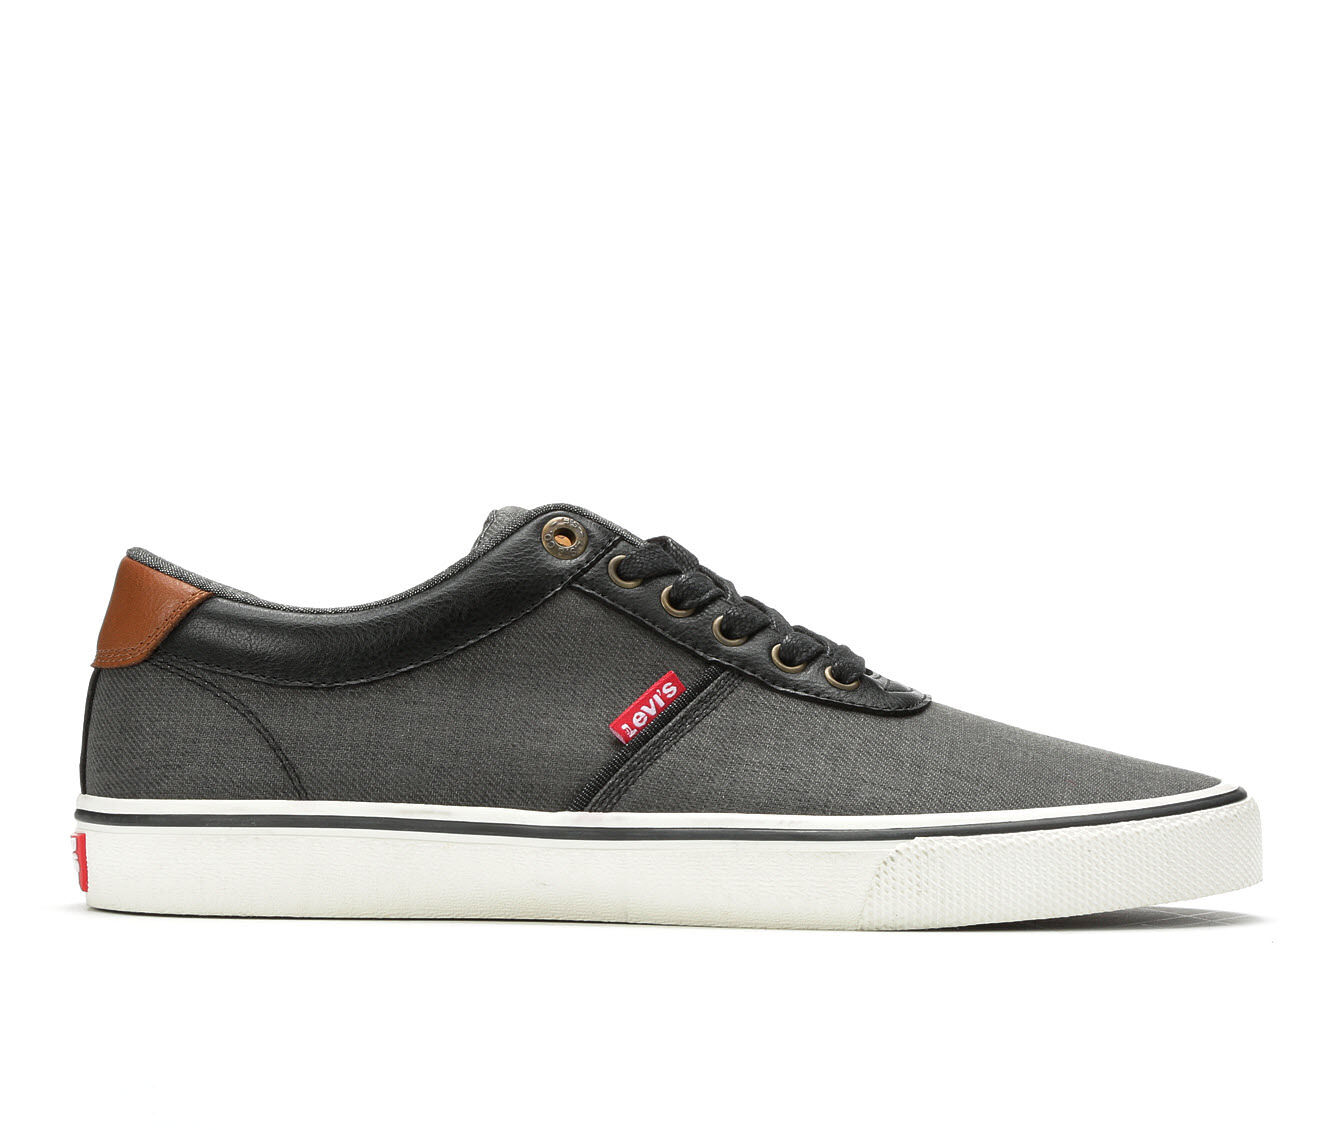 uk shoes_kd1059